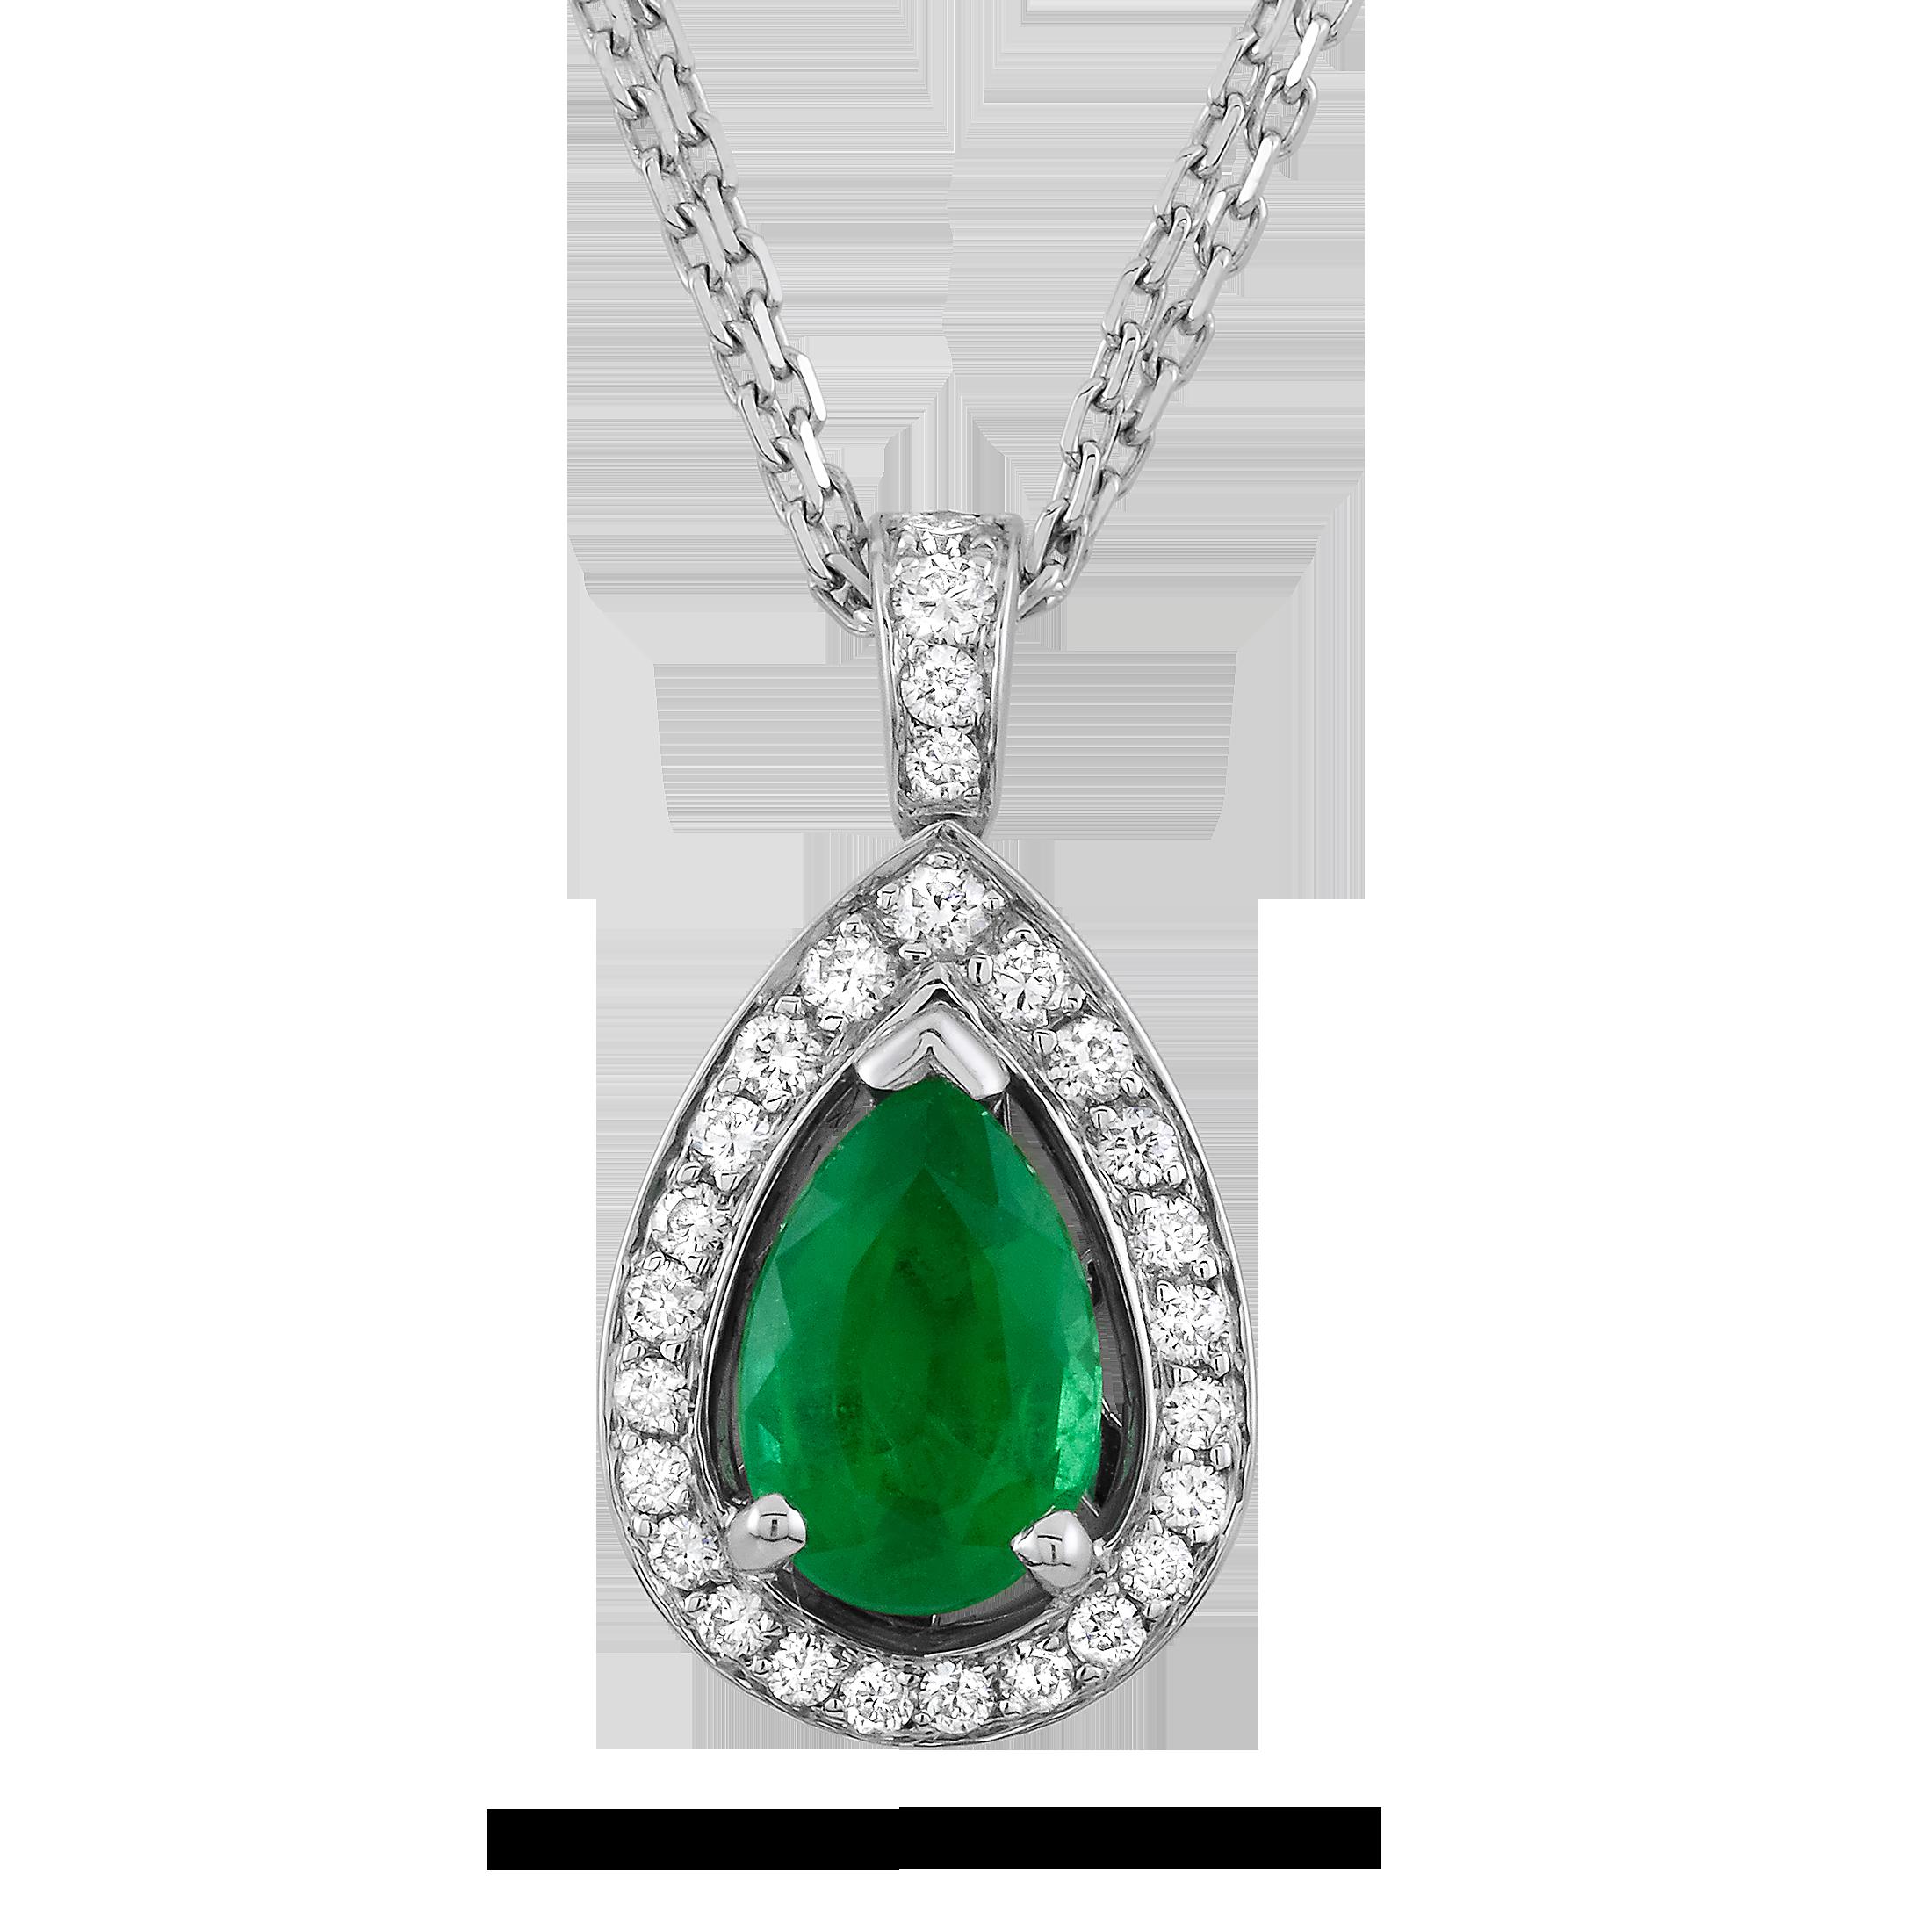 Green sapphire pendant with diamonds jewelry collection green sapphire pendant with diamonds jewelry collection aloadofball Choice Image